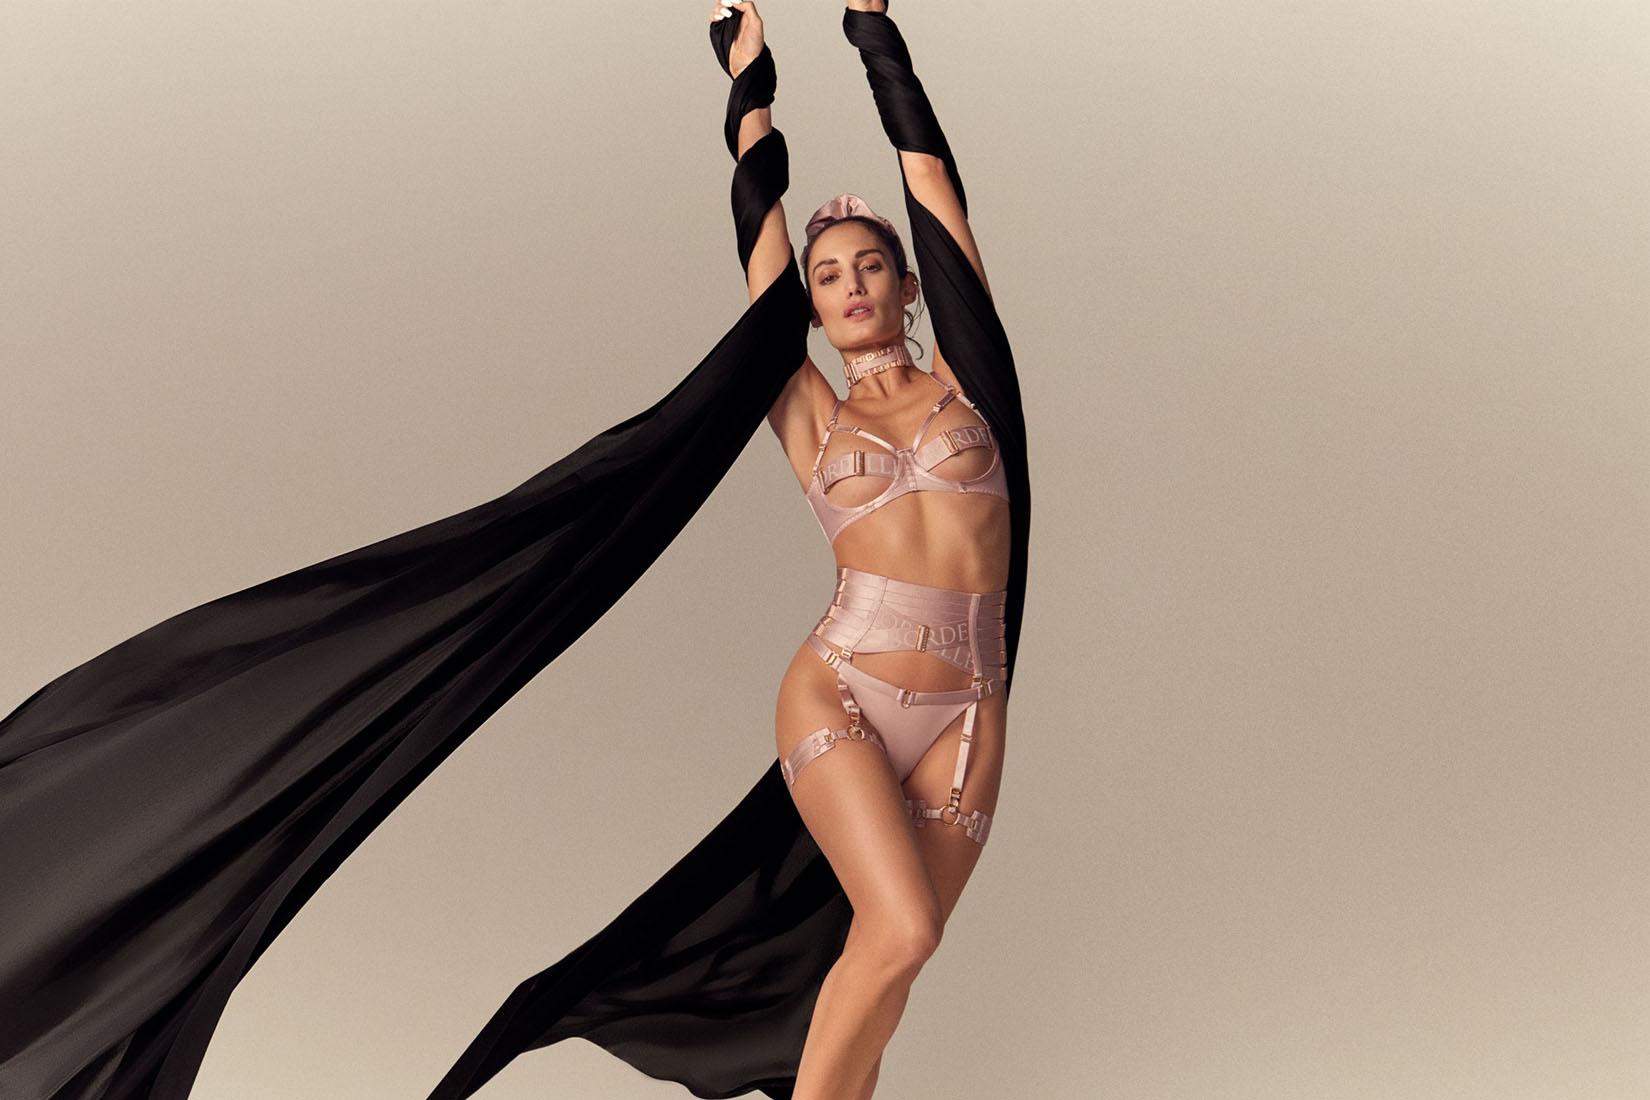 best lingerie brands Bordelle review Luxe Digital